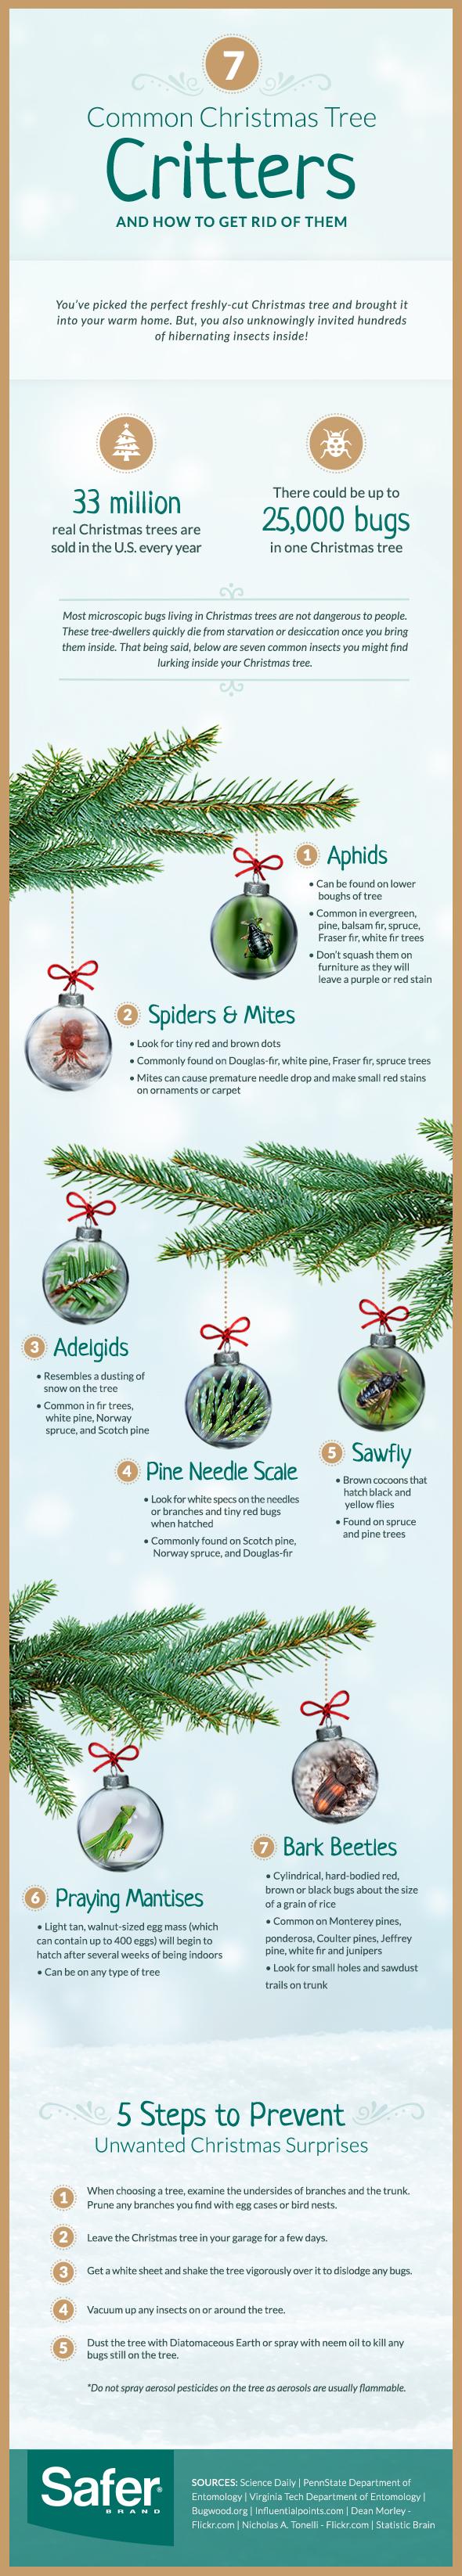 bugs in Christmas tree